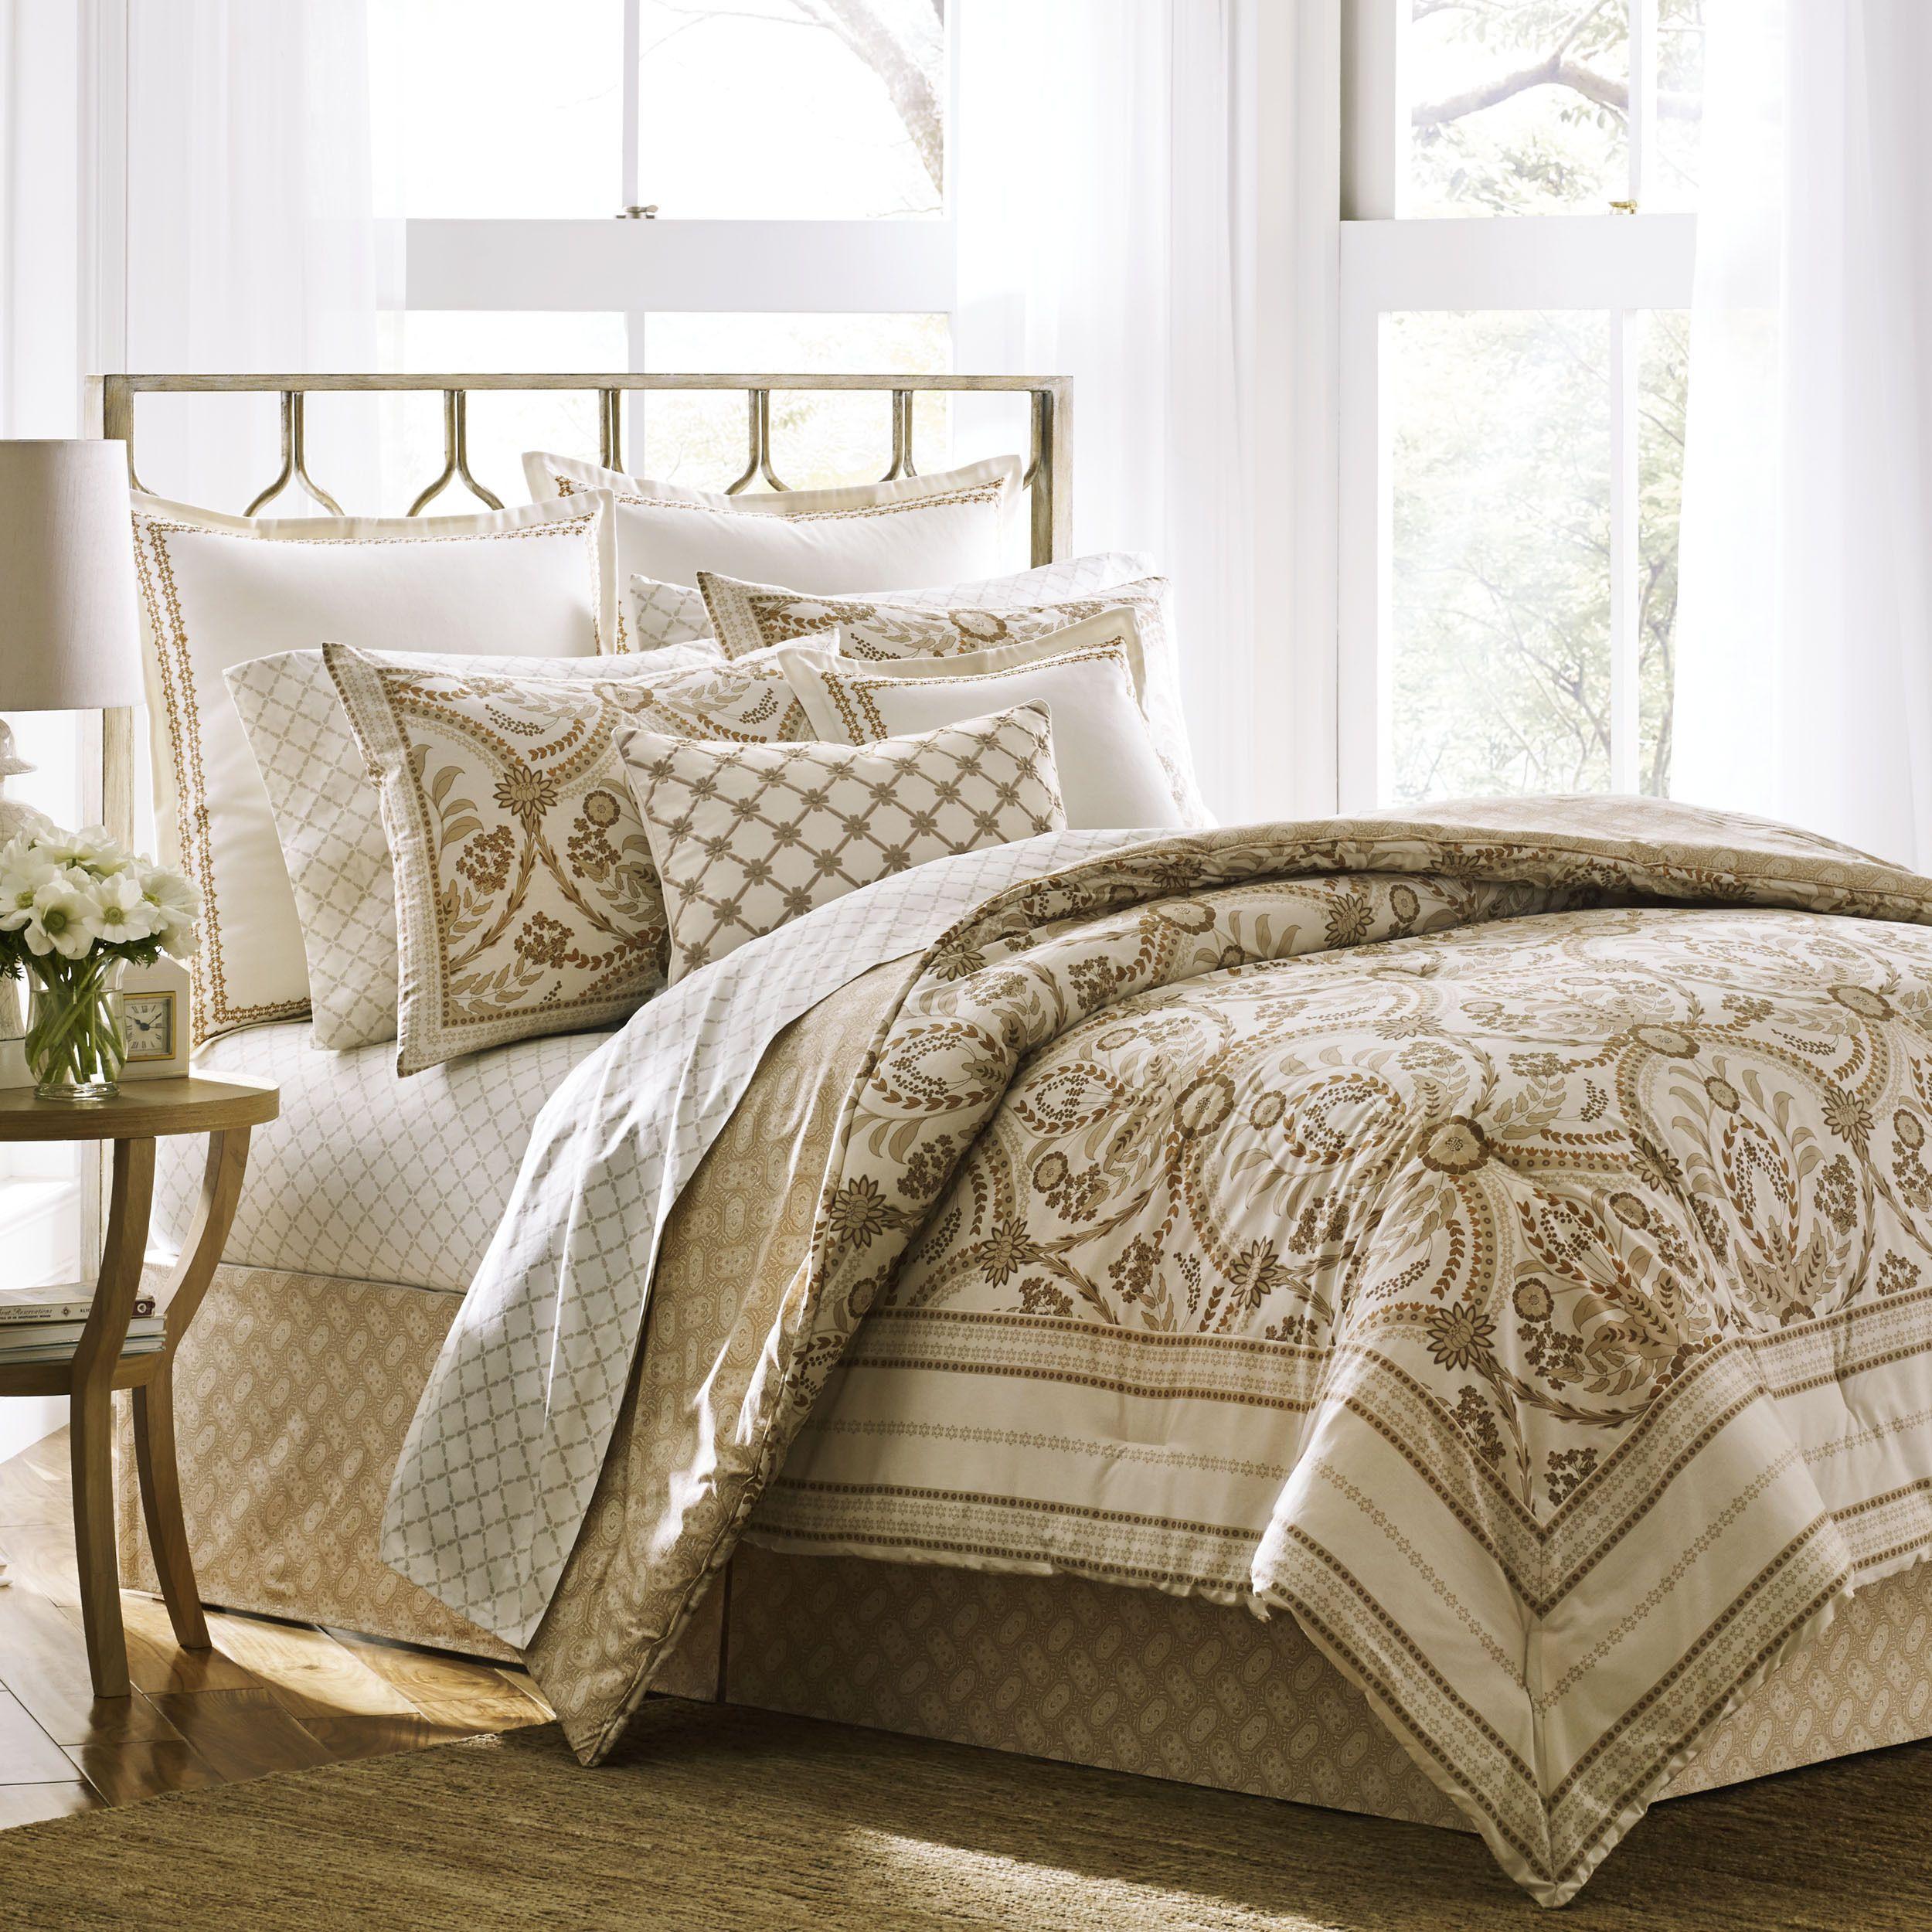 Laura Ashley Almedia Comforter Set Bedding sets